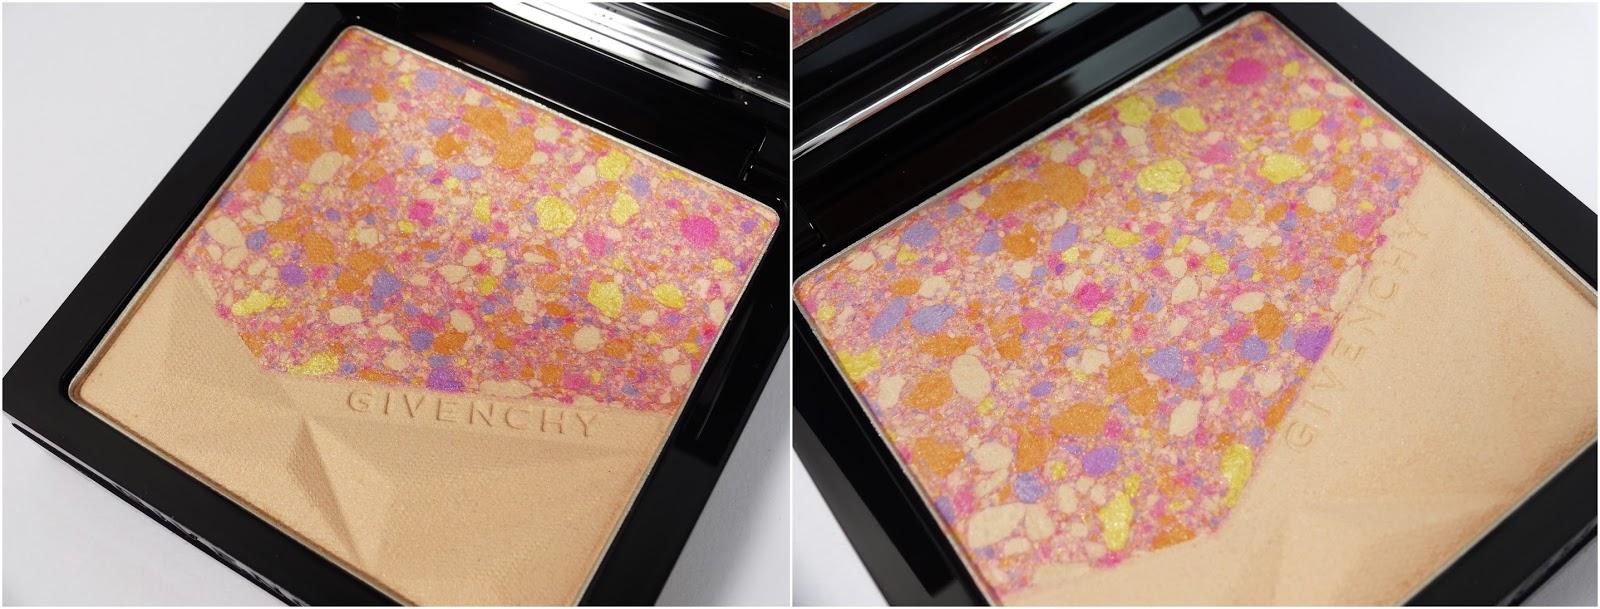 Givenchy - Le Prisme Visage Color Confetti (Spring 2015)